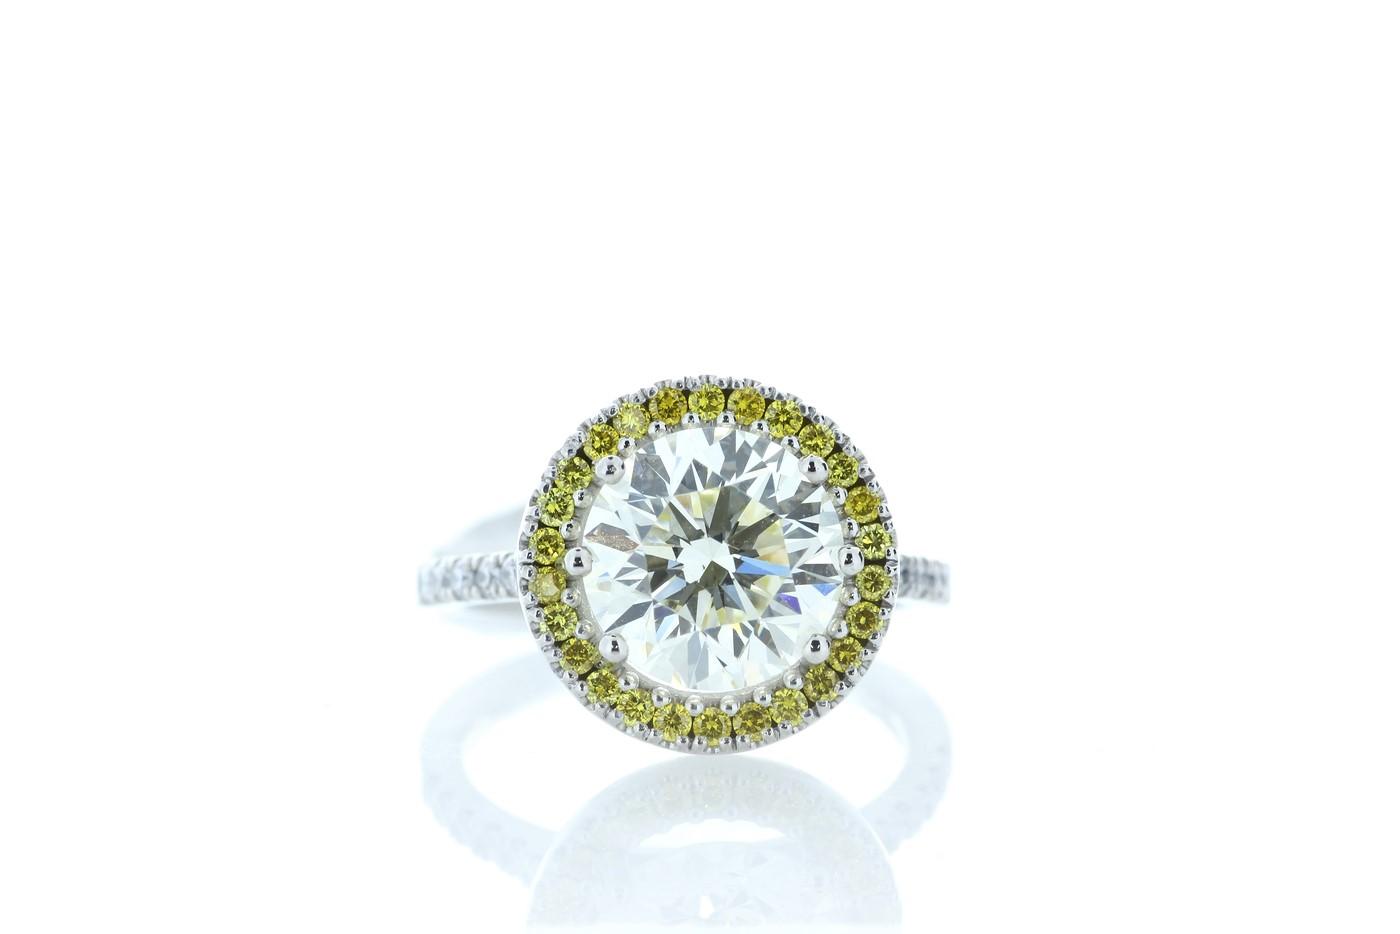 18ct White Gold Halo Set Diamond Ring 3.43 Carats